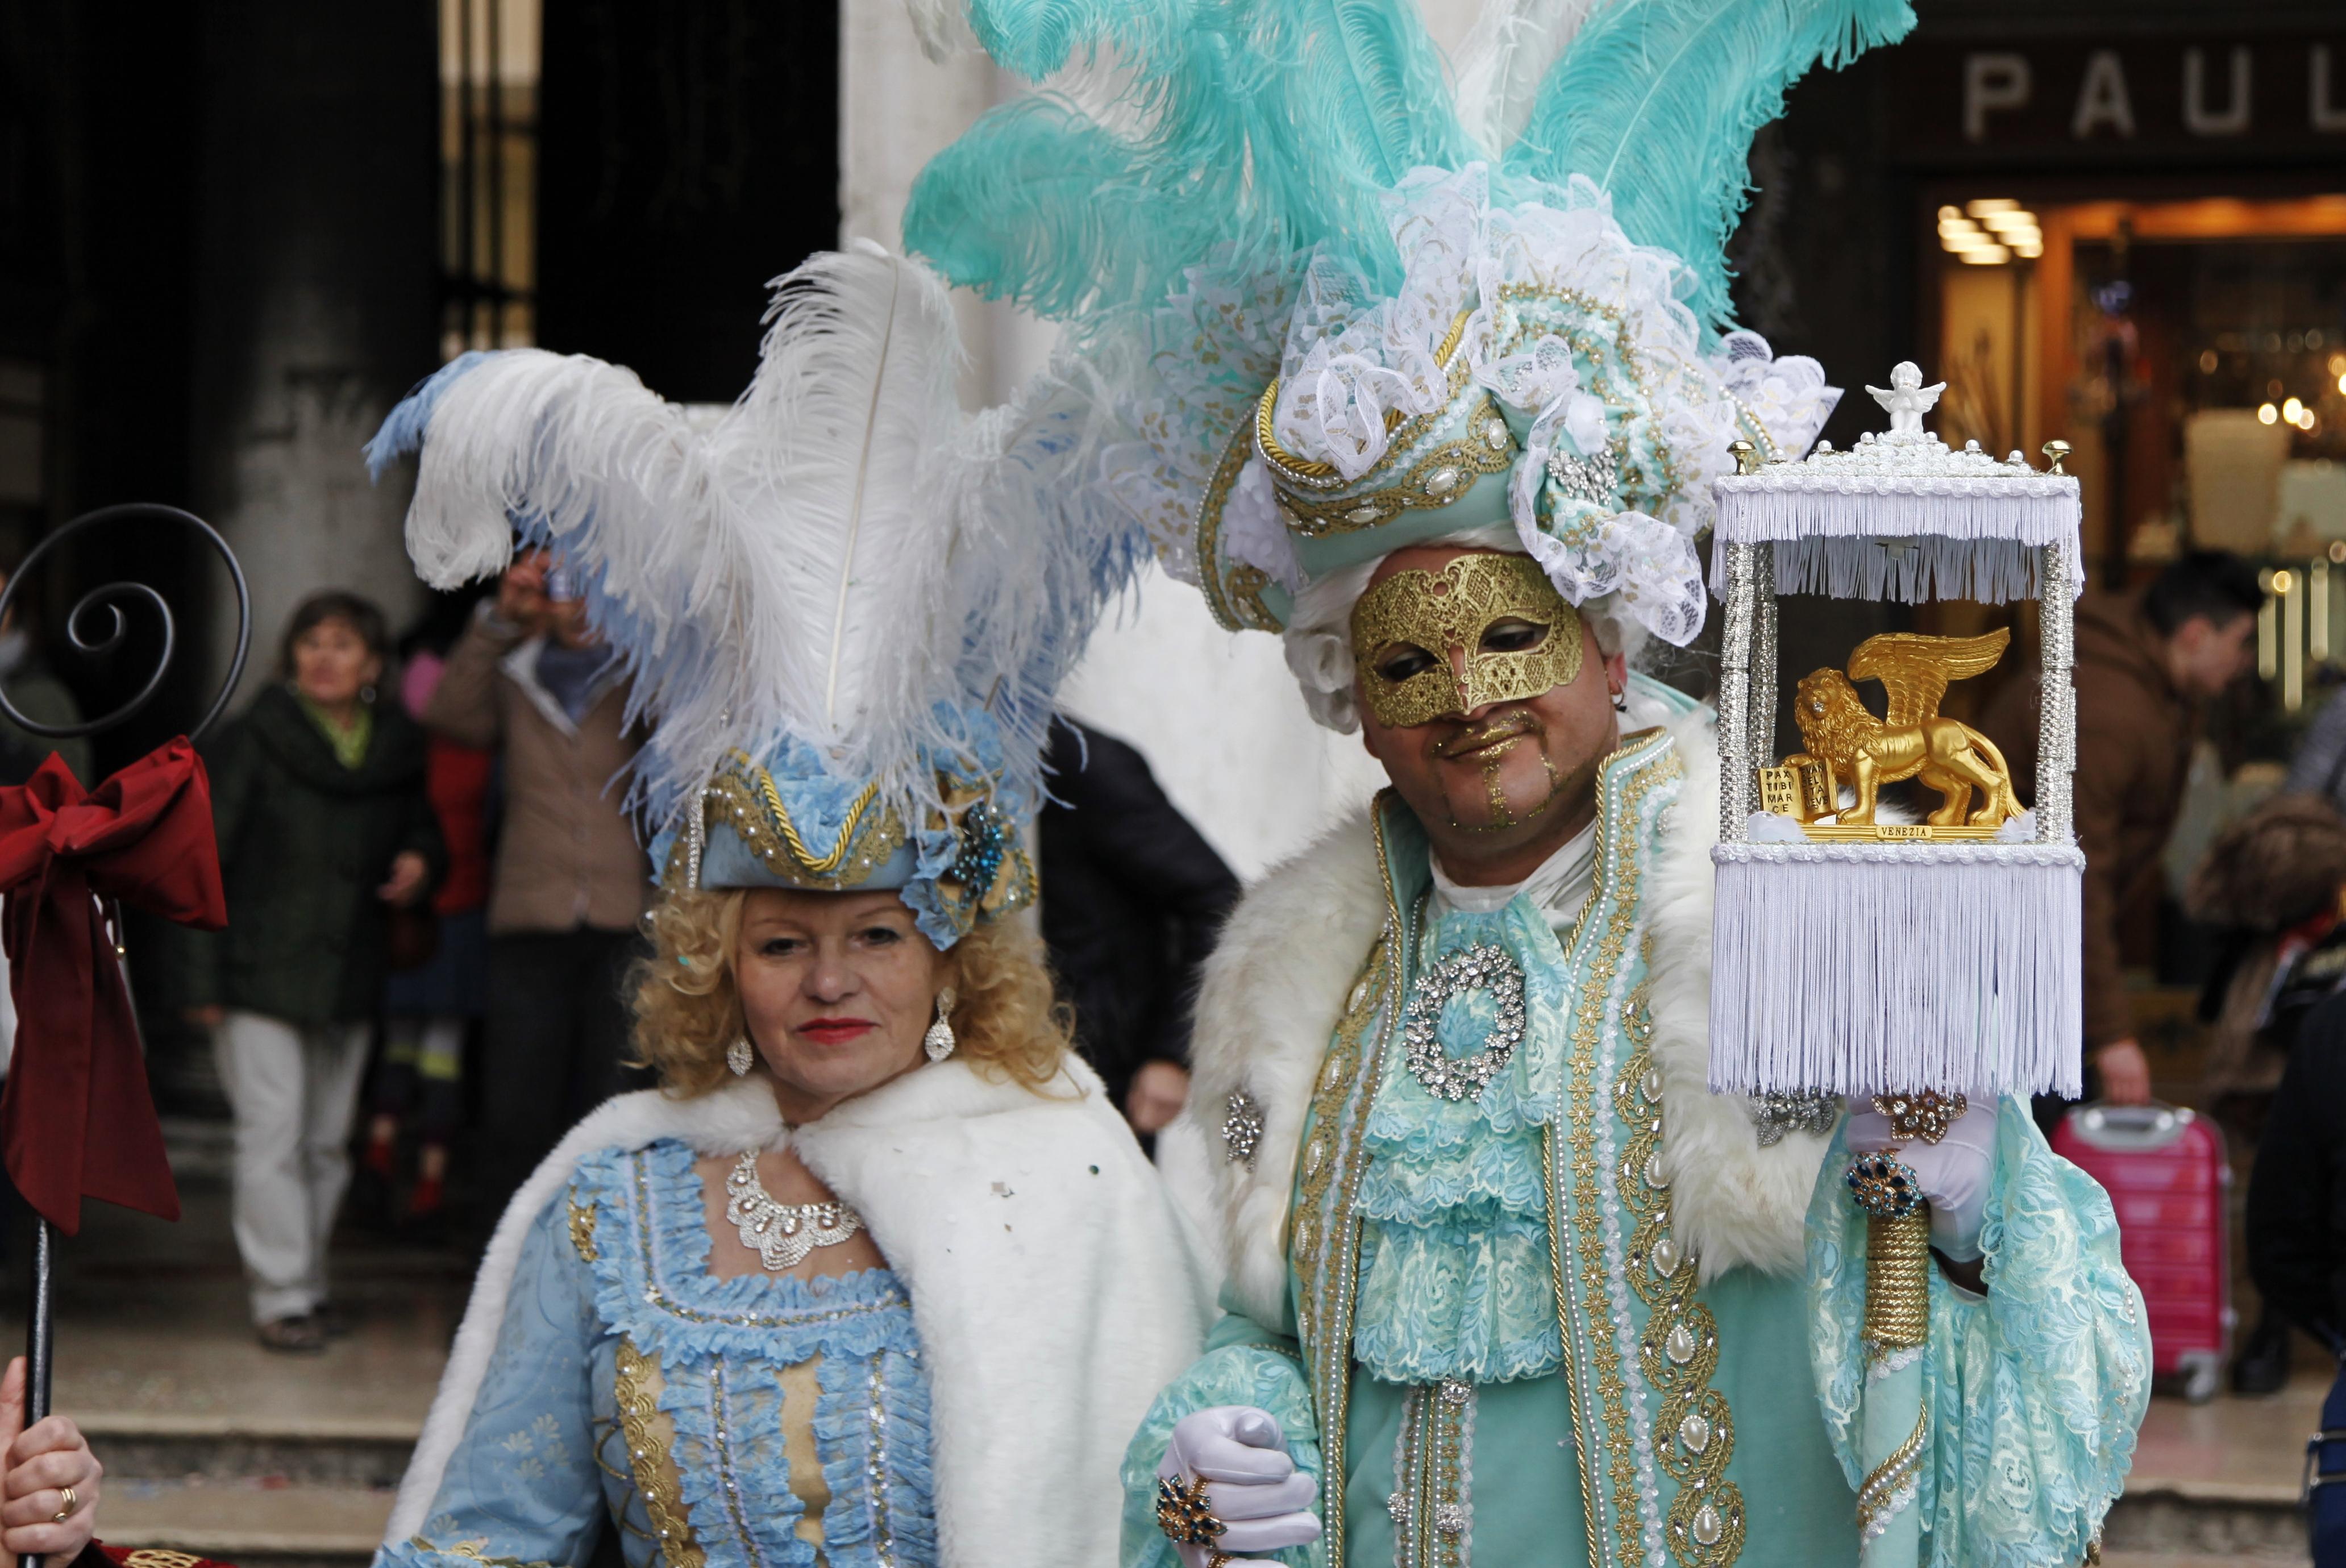 Carnevale 3